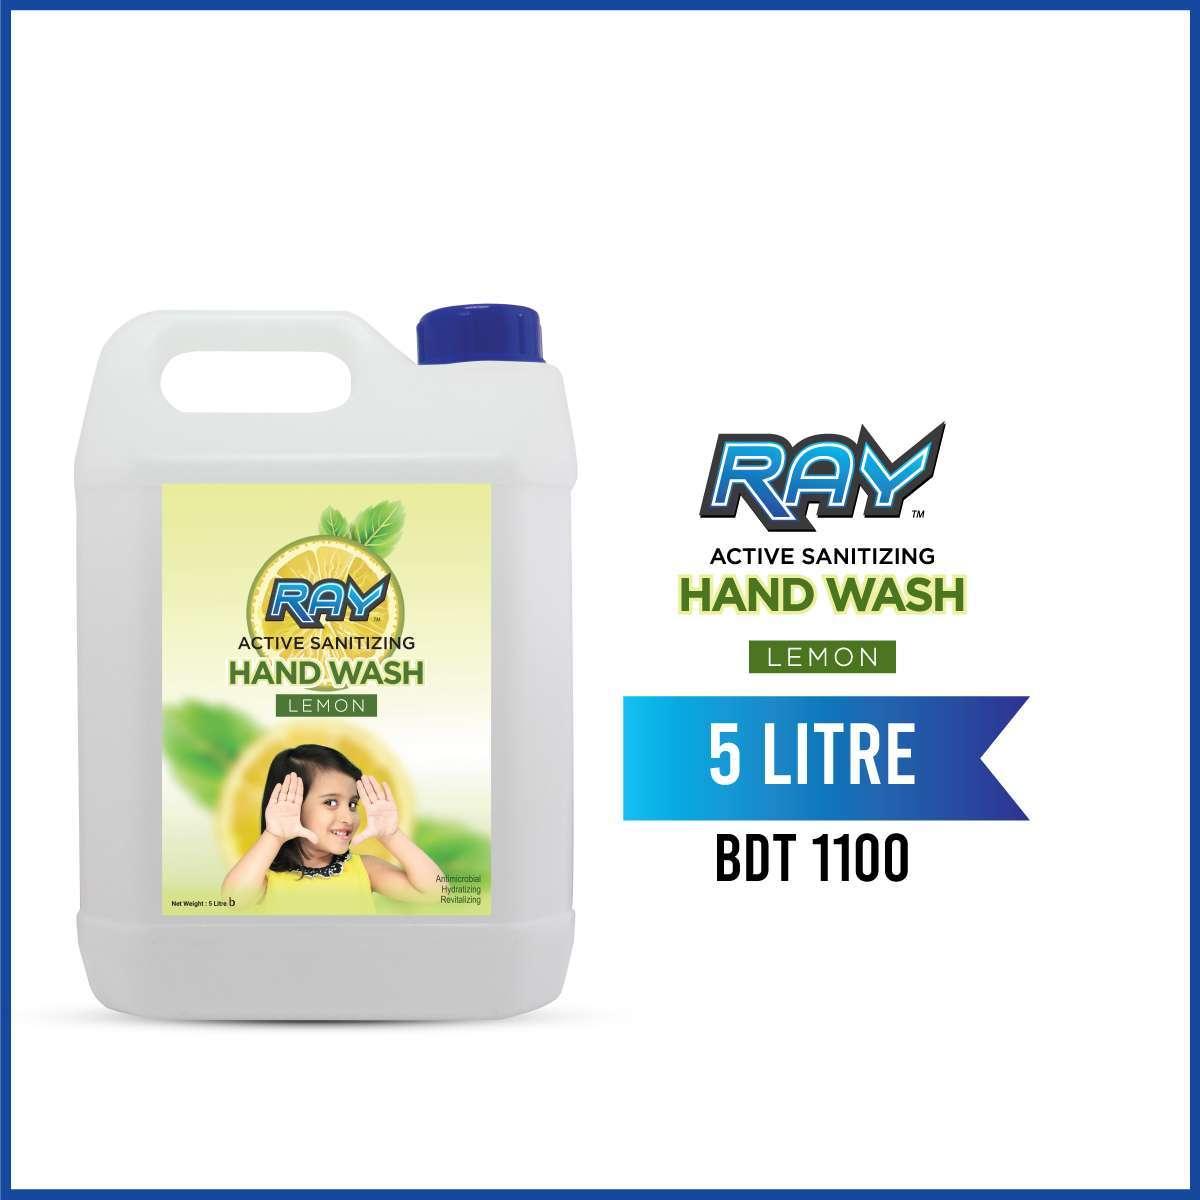 RAY Active Sanitizing Hand Wash Refill 5 Liter Lemon